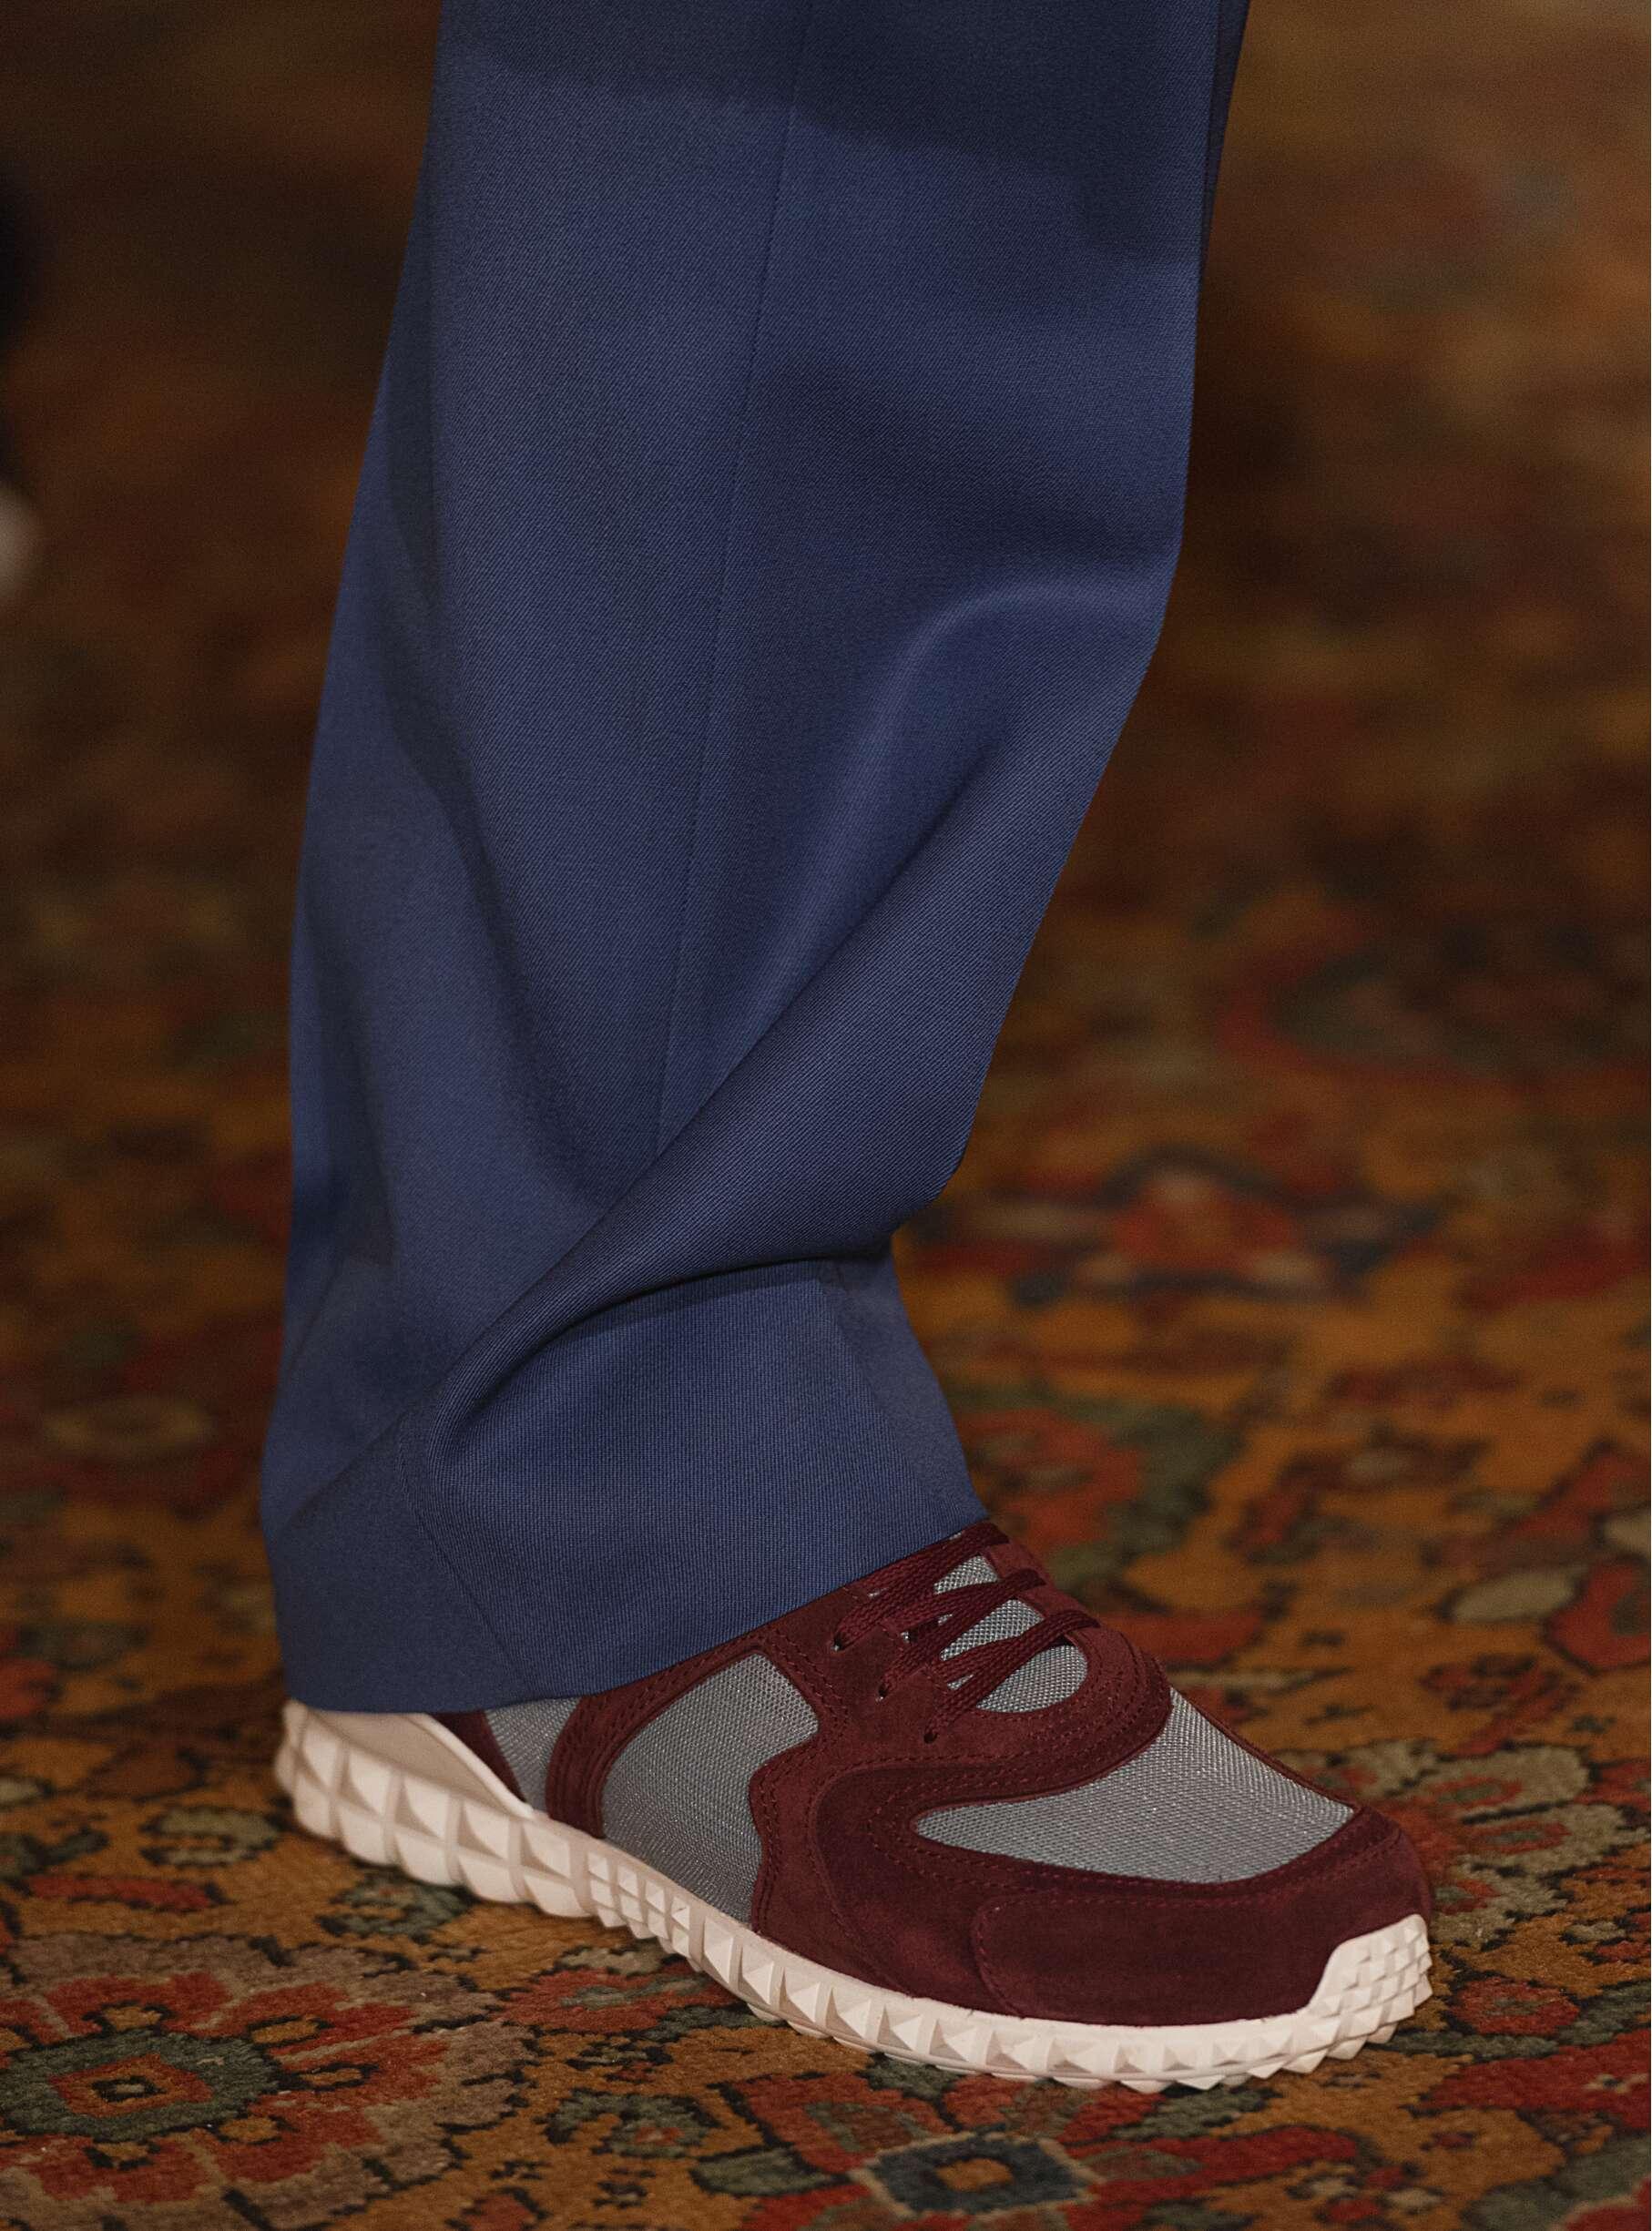 Detail Shoe Winter 2017 Fashion Trends Valentino